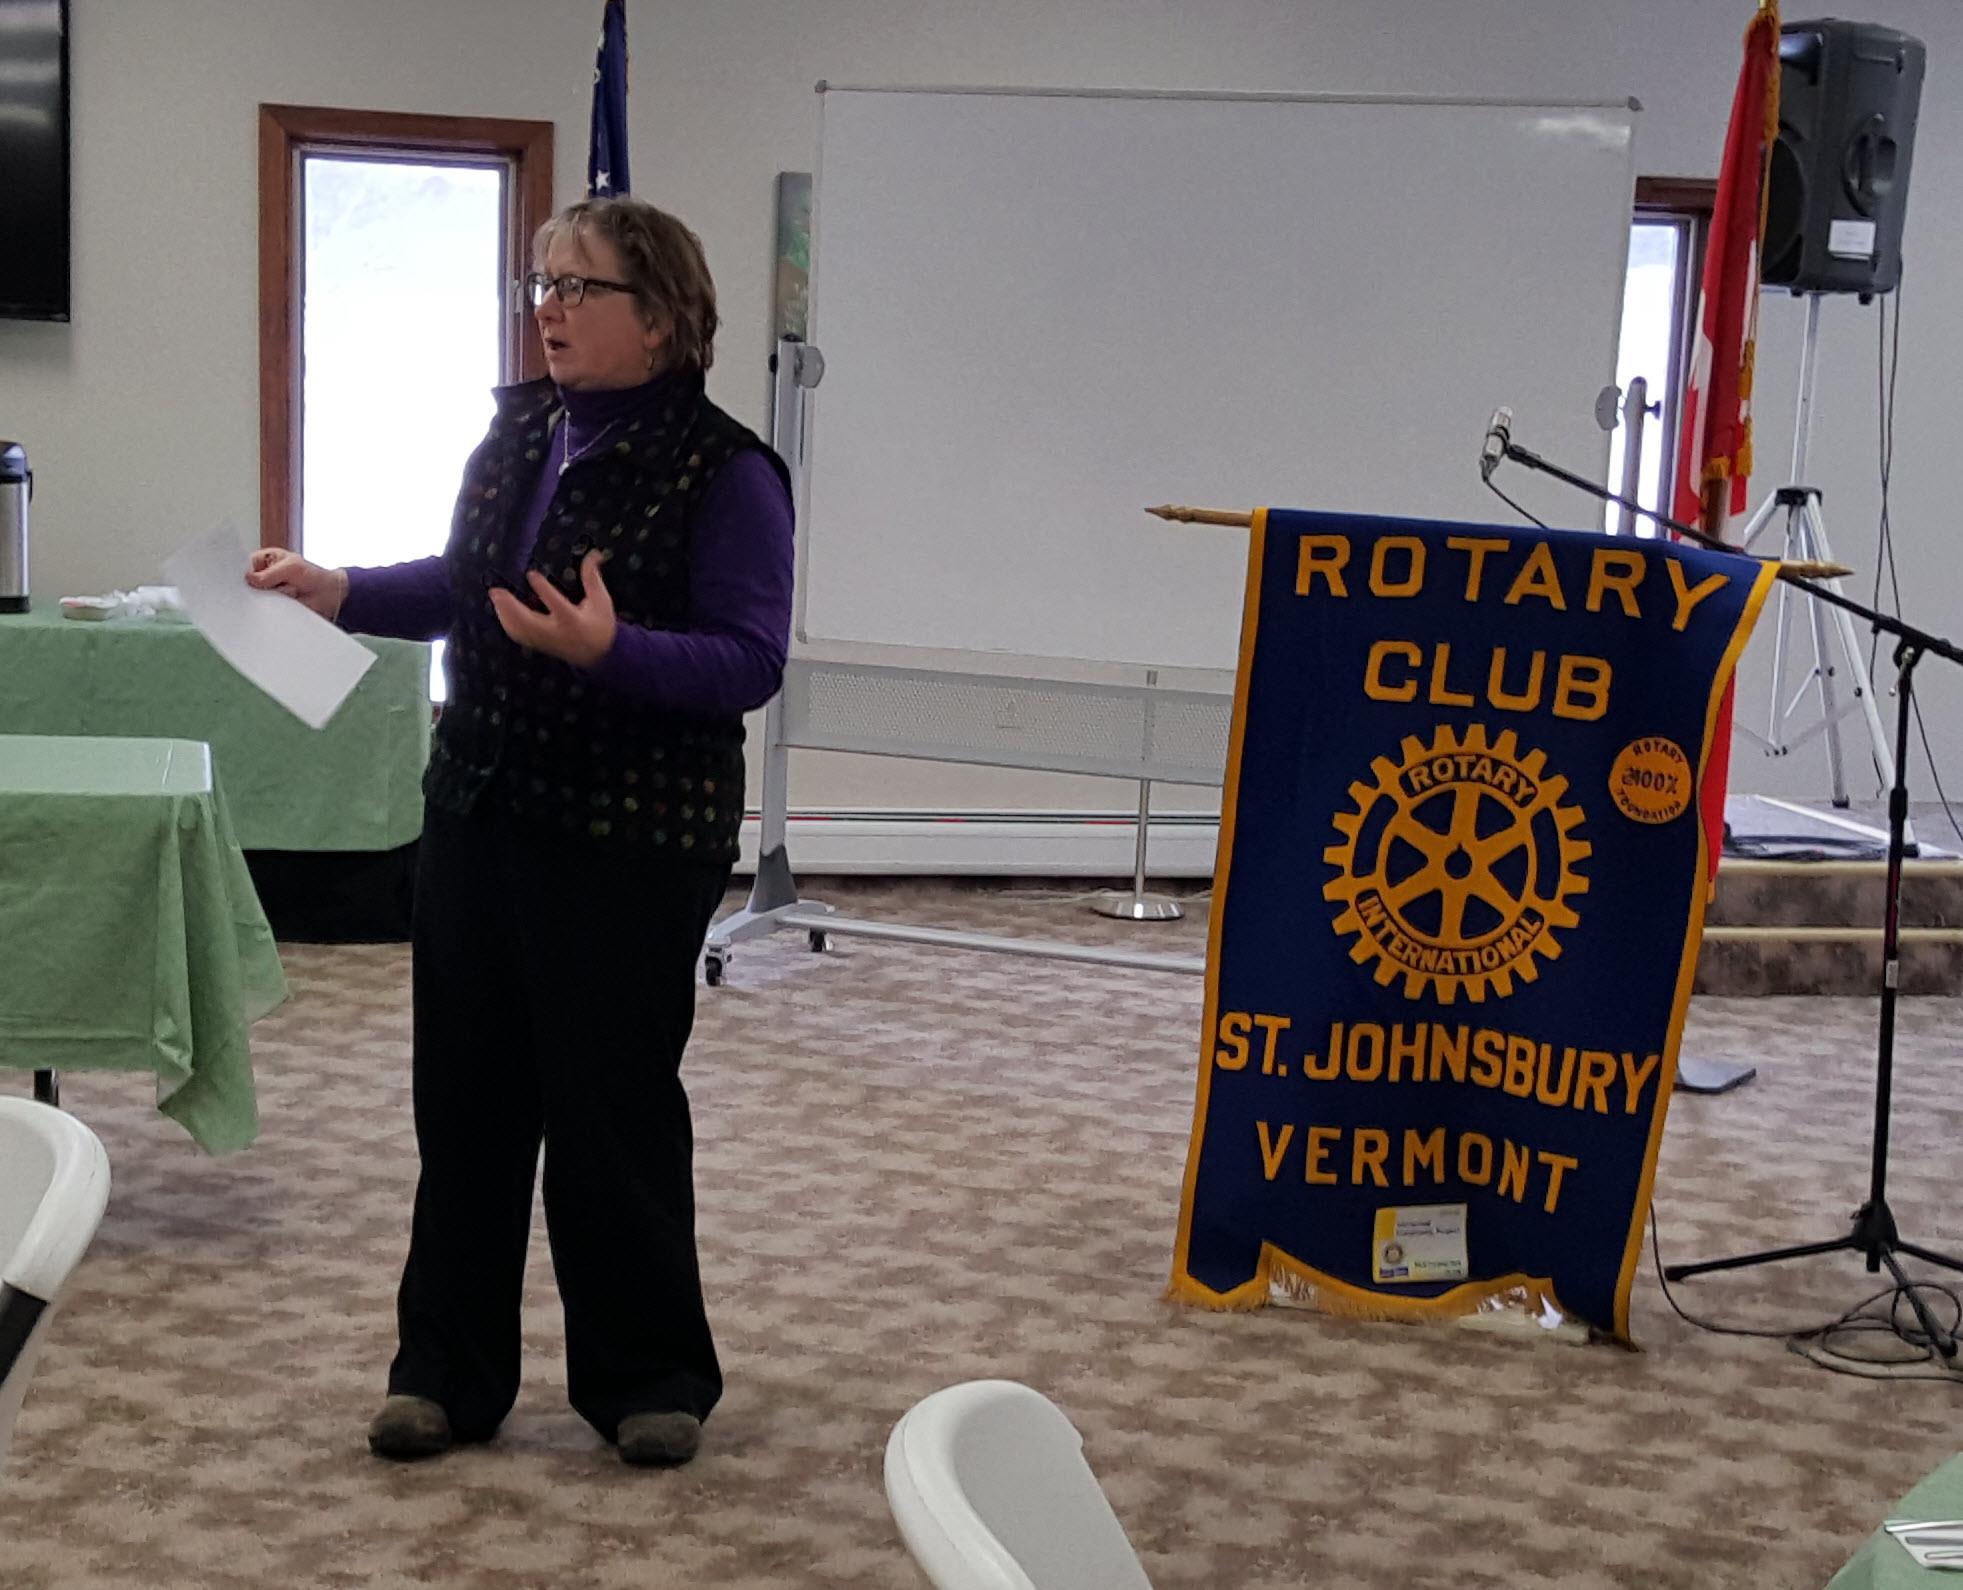 2017-01-09 St  Johnsbury Rotary Bulletin (Jan 09, 2017)